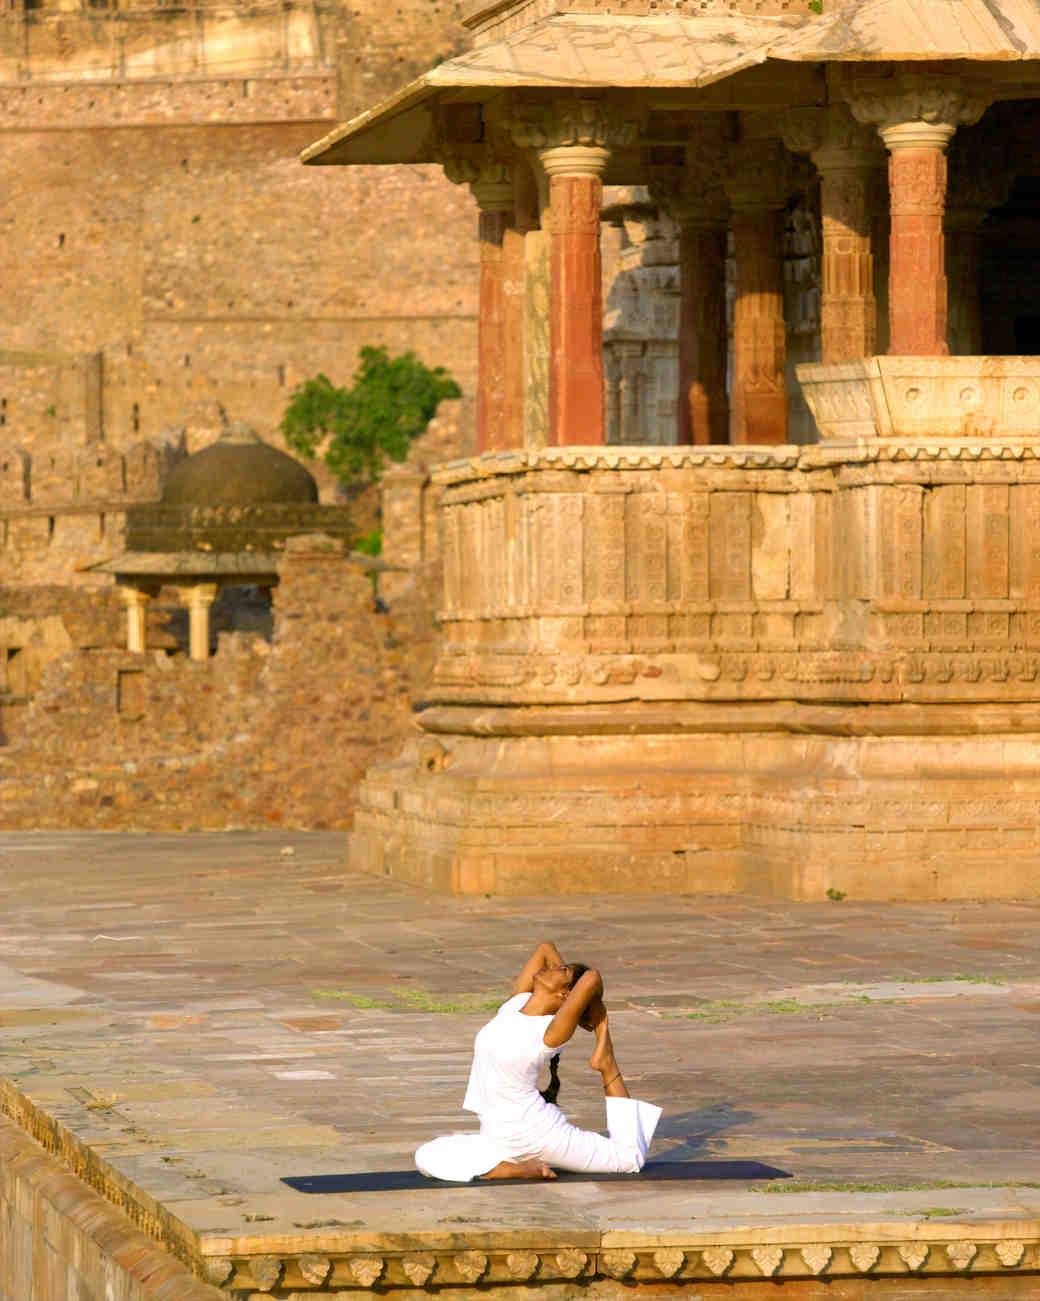 sting-trudie-styler-inspired-wedding-amanbagh-honeymoon-destination-0814.jpg